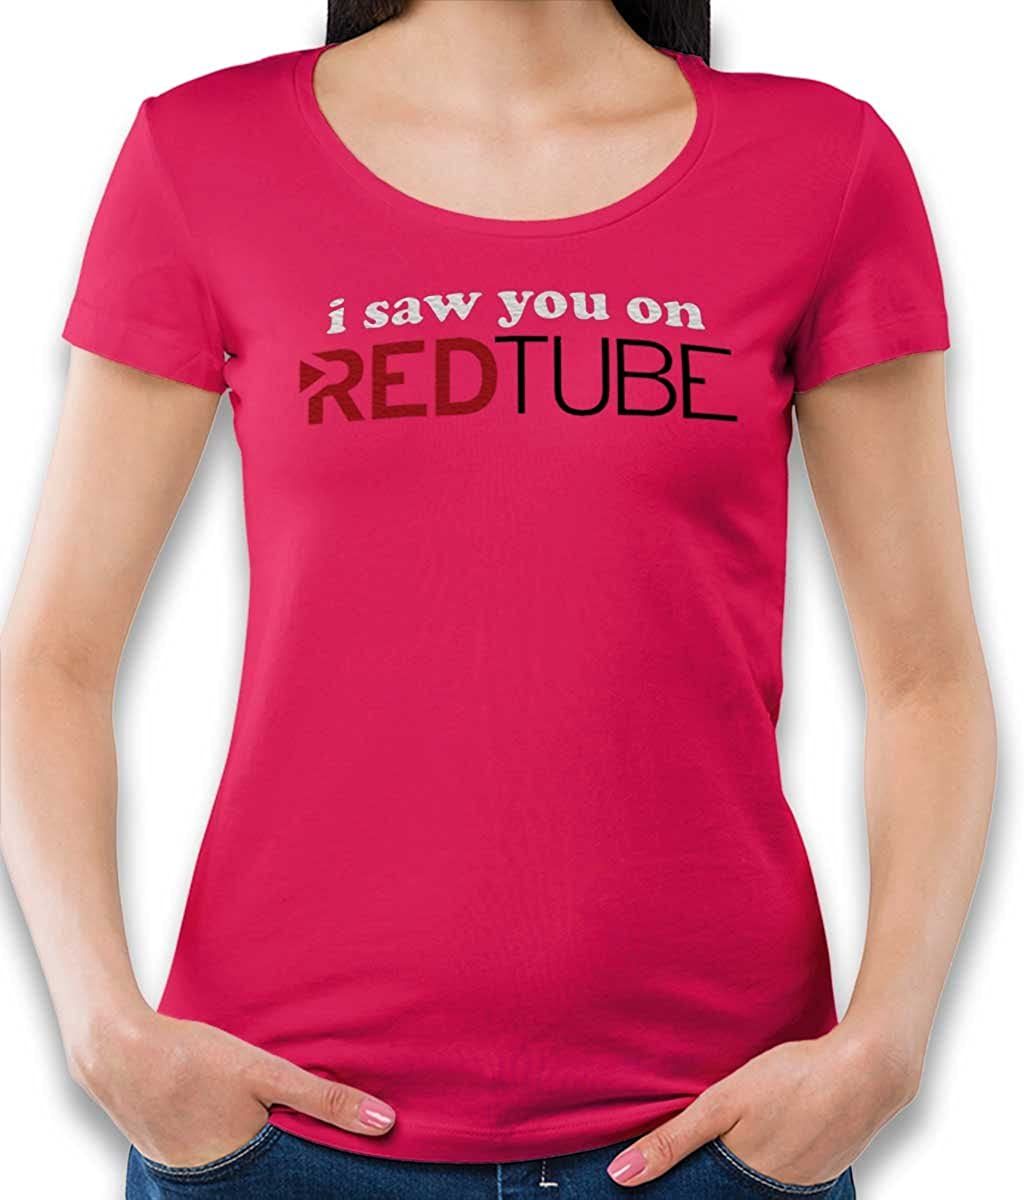 shirtminister Saw You On Red Tube Damen T-Shirt - Viele